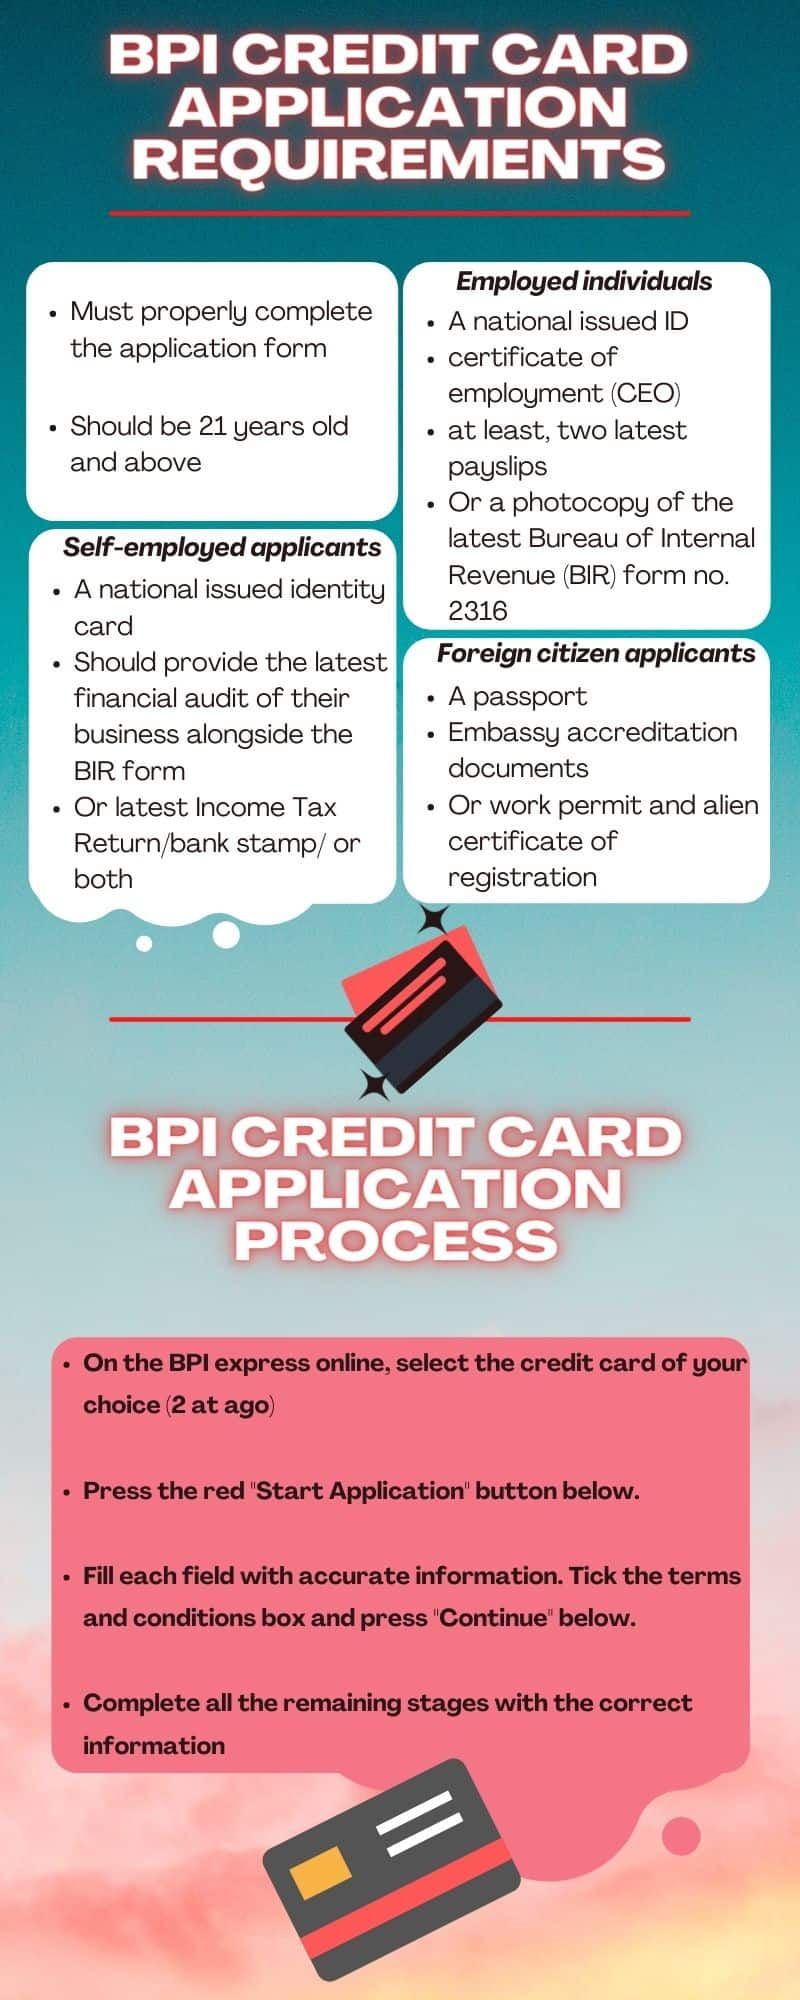 BPI credit card application